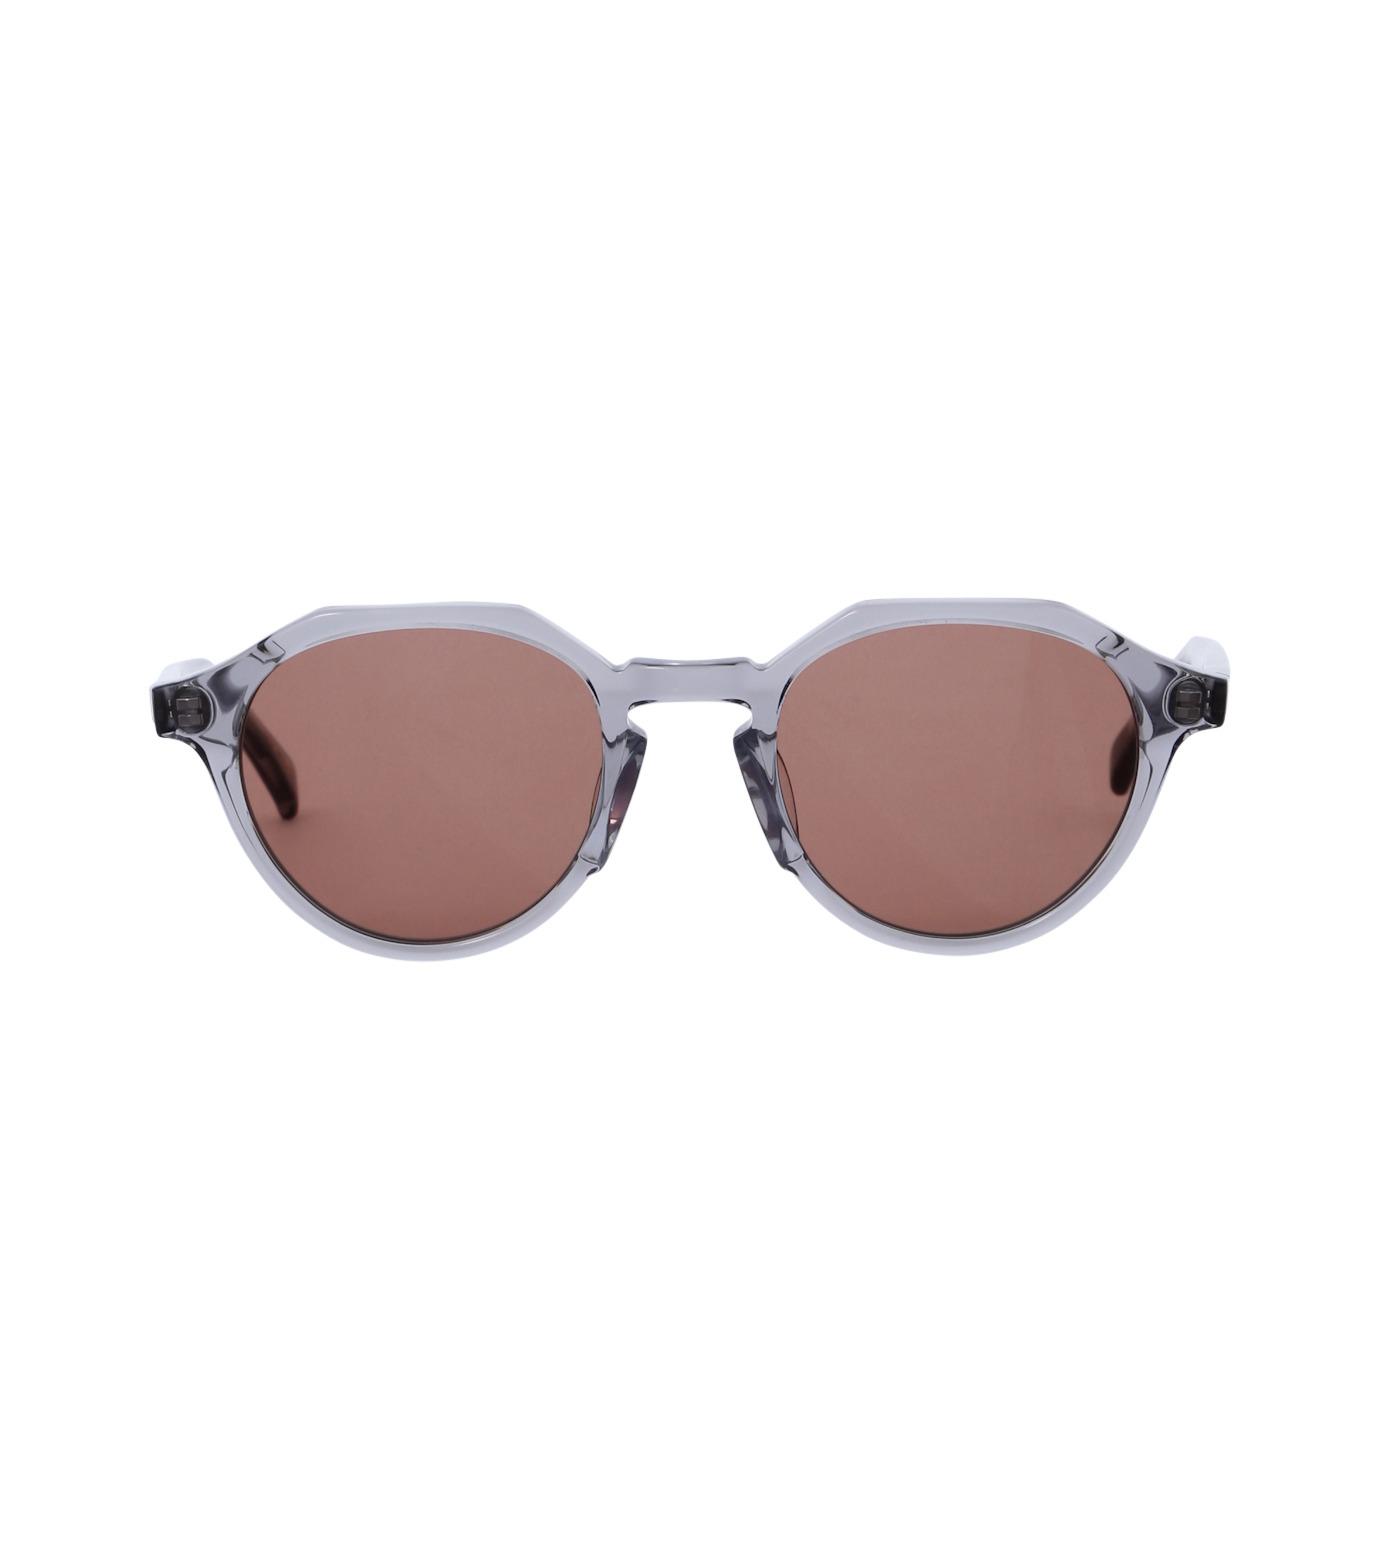 BLANC(ブラン)のOctagon Sunglass-GRAY(アイウェア/eyewear)-BM001-11 拡大詳細画像3